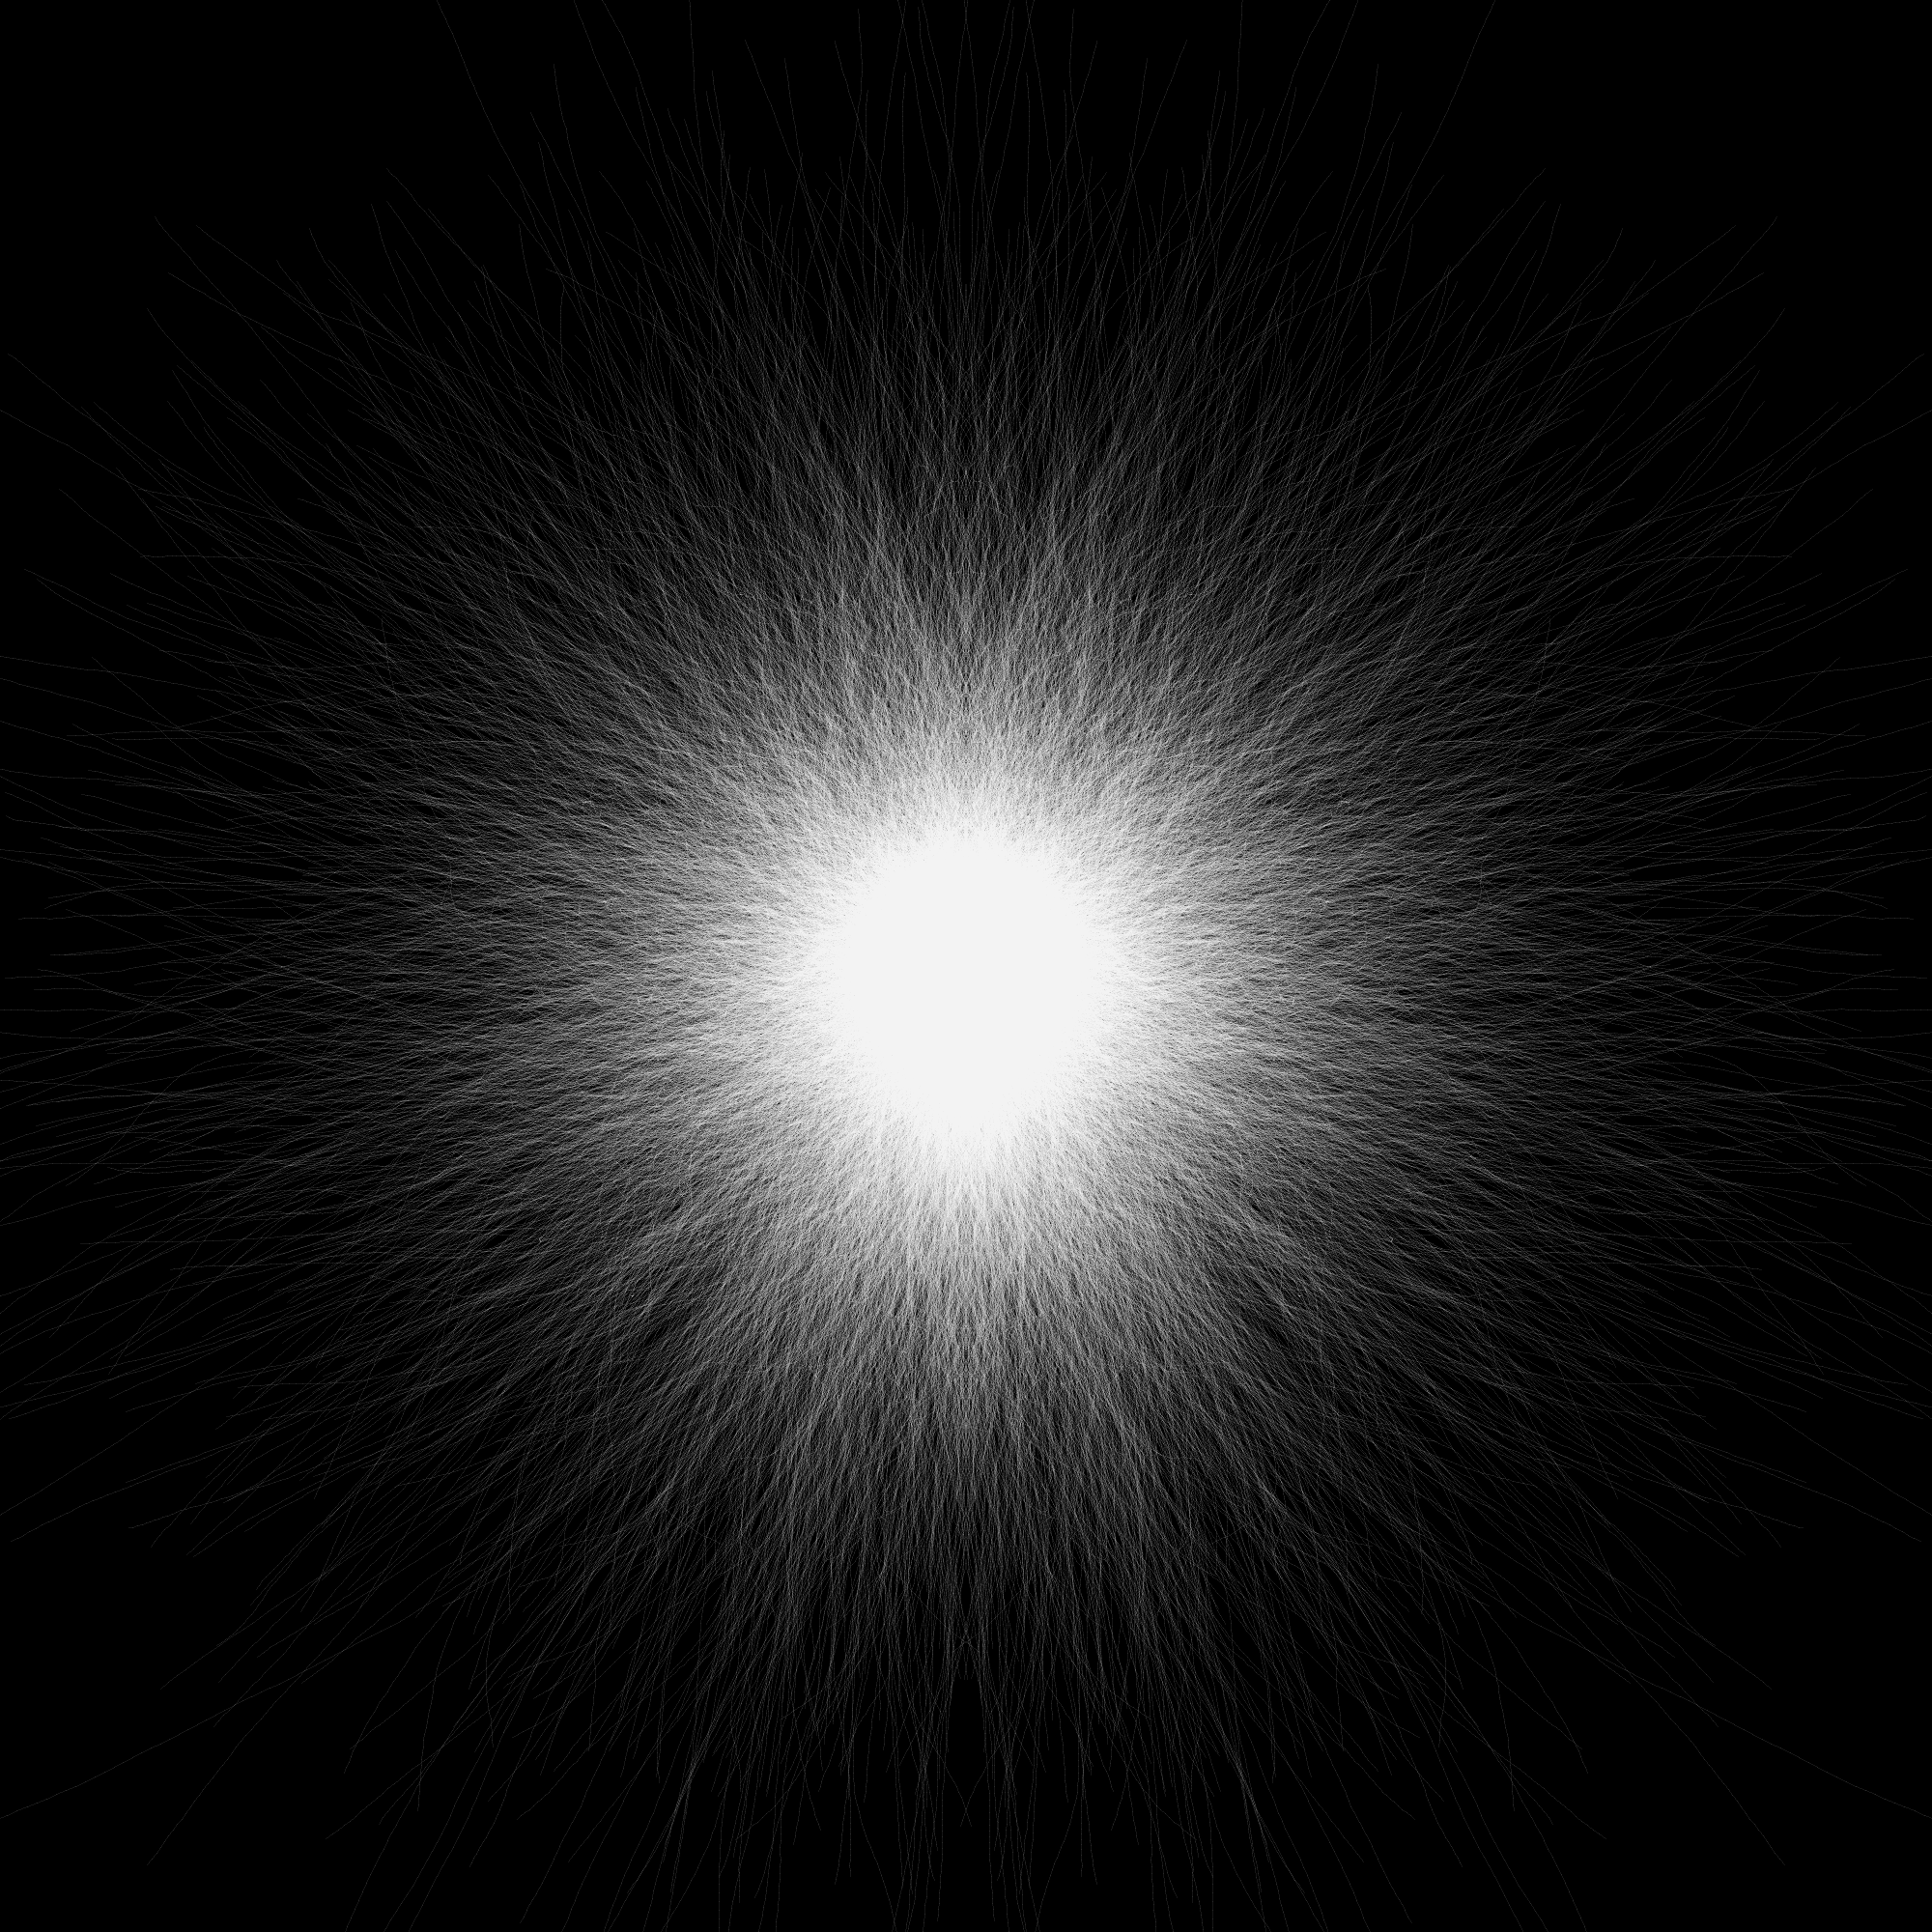 binaryAge-000446